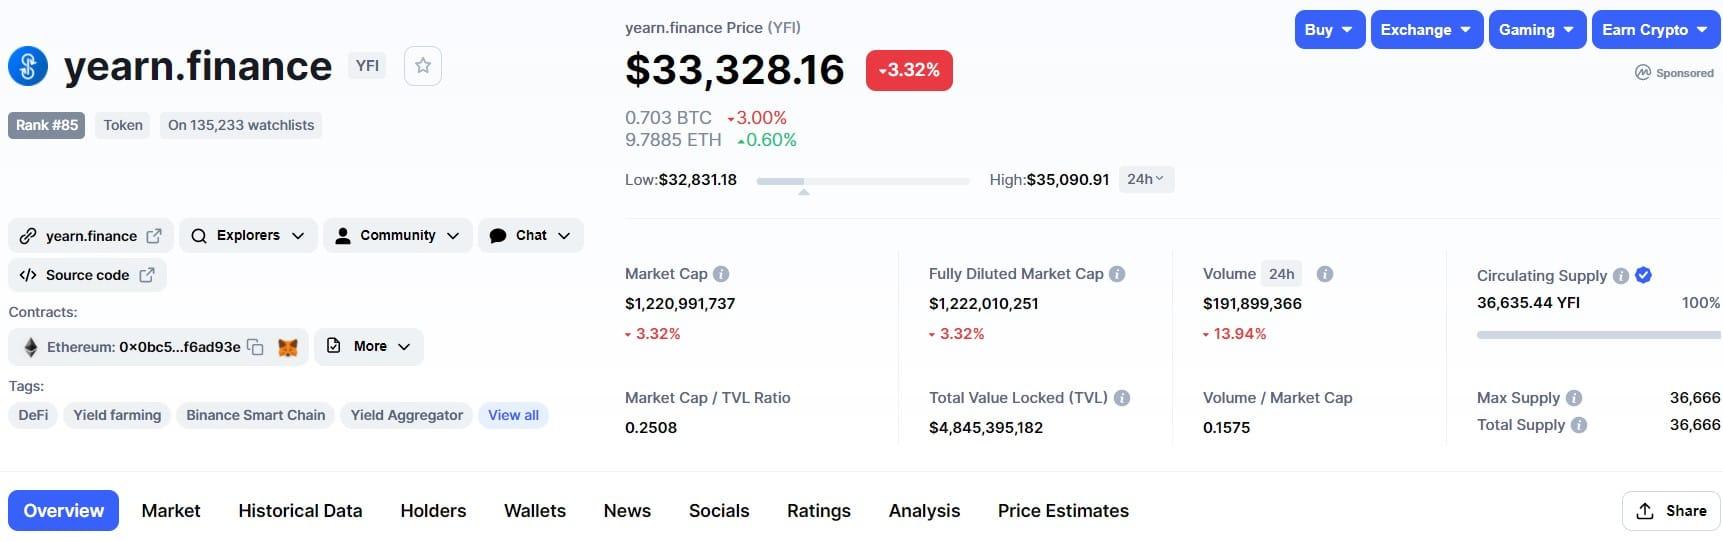 yearn.finance price